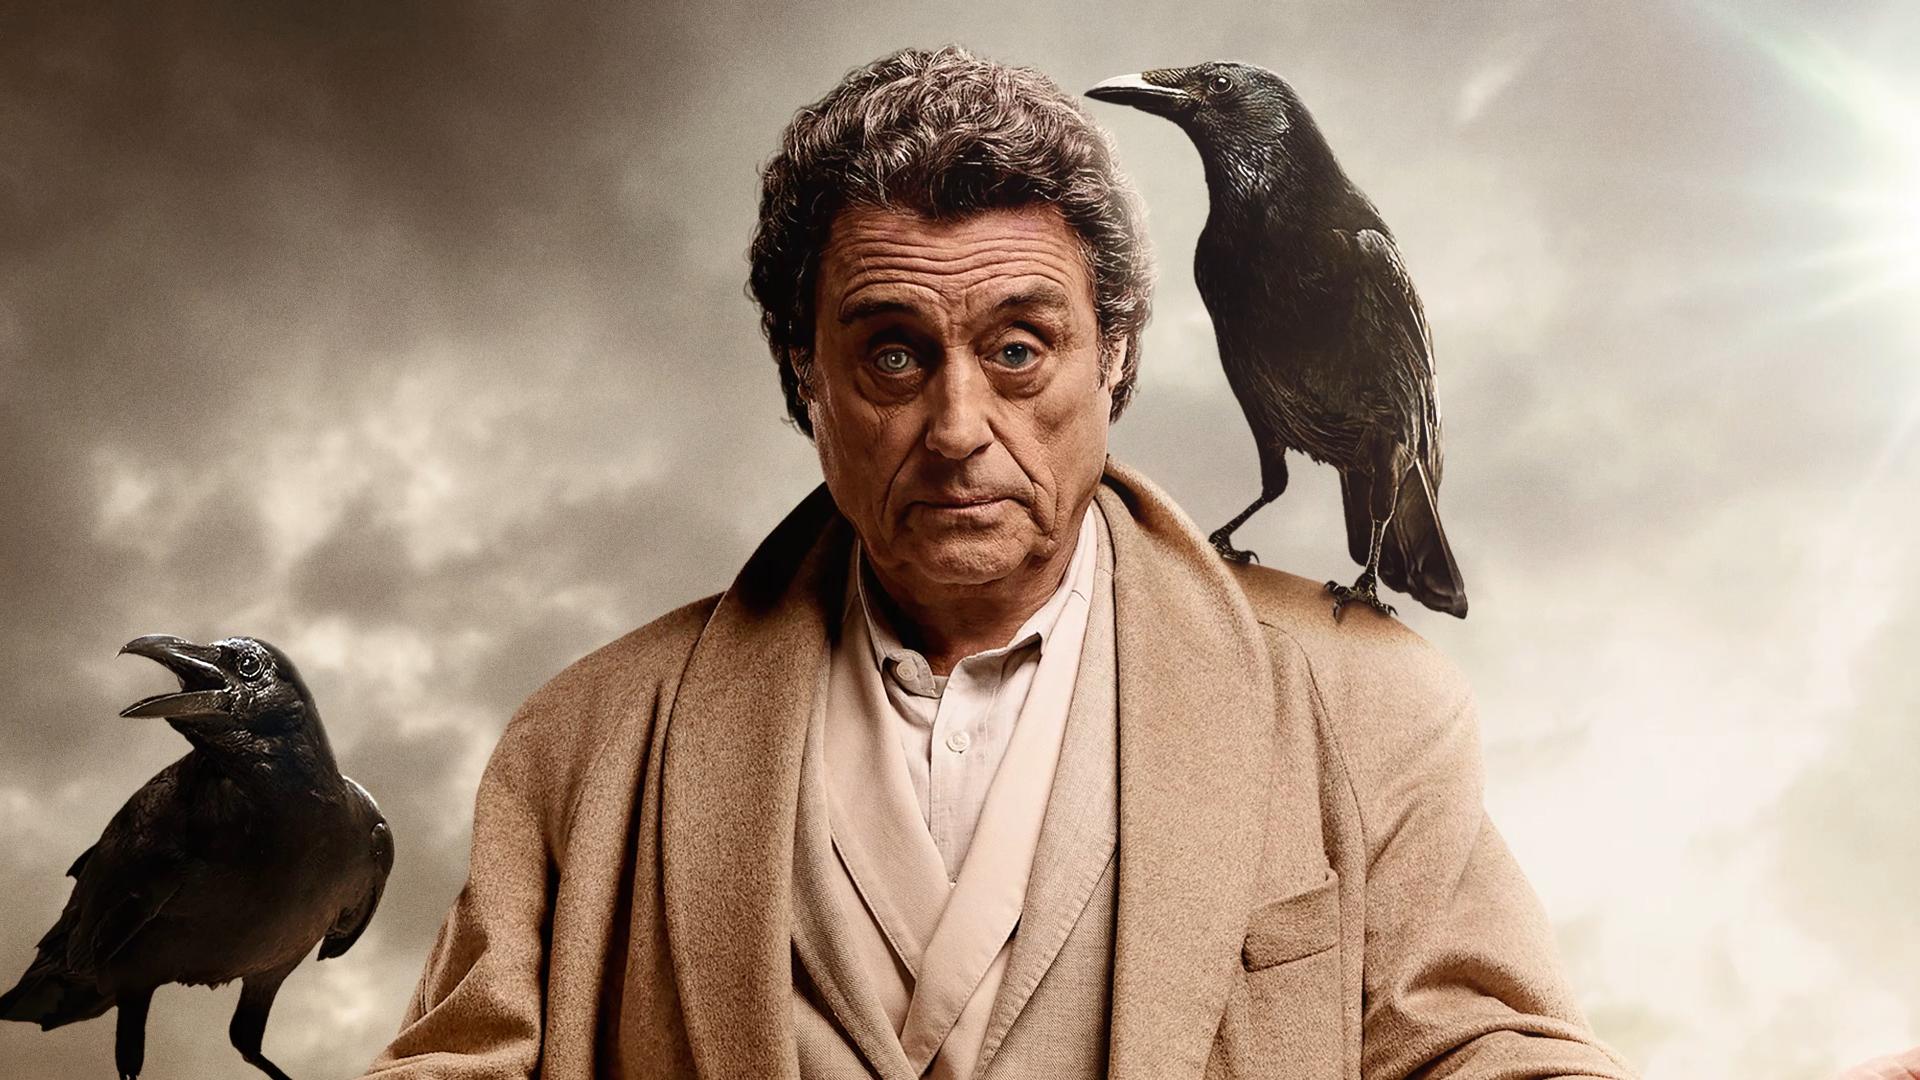 Wallpaper TV series, American Gods, crow, Ian McShane, actor